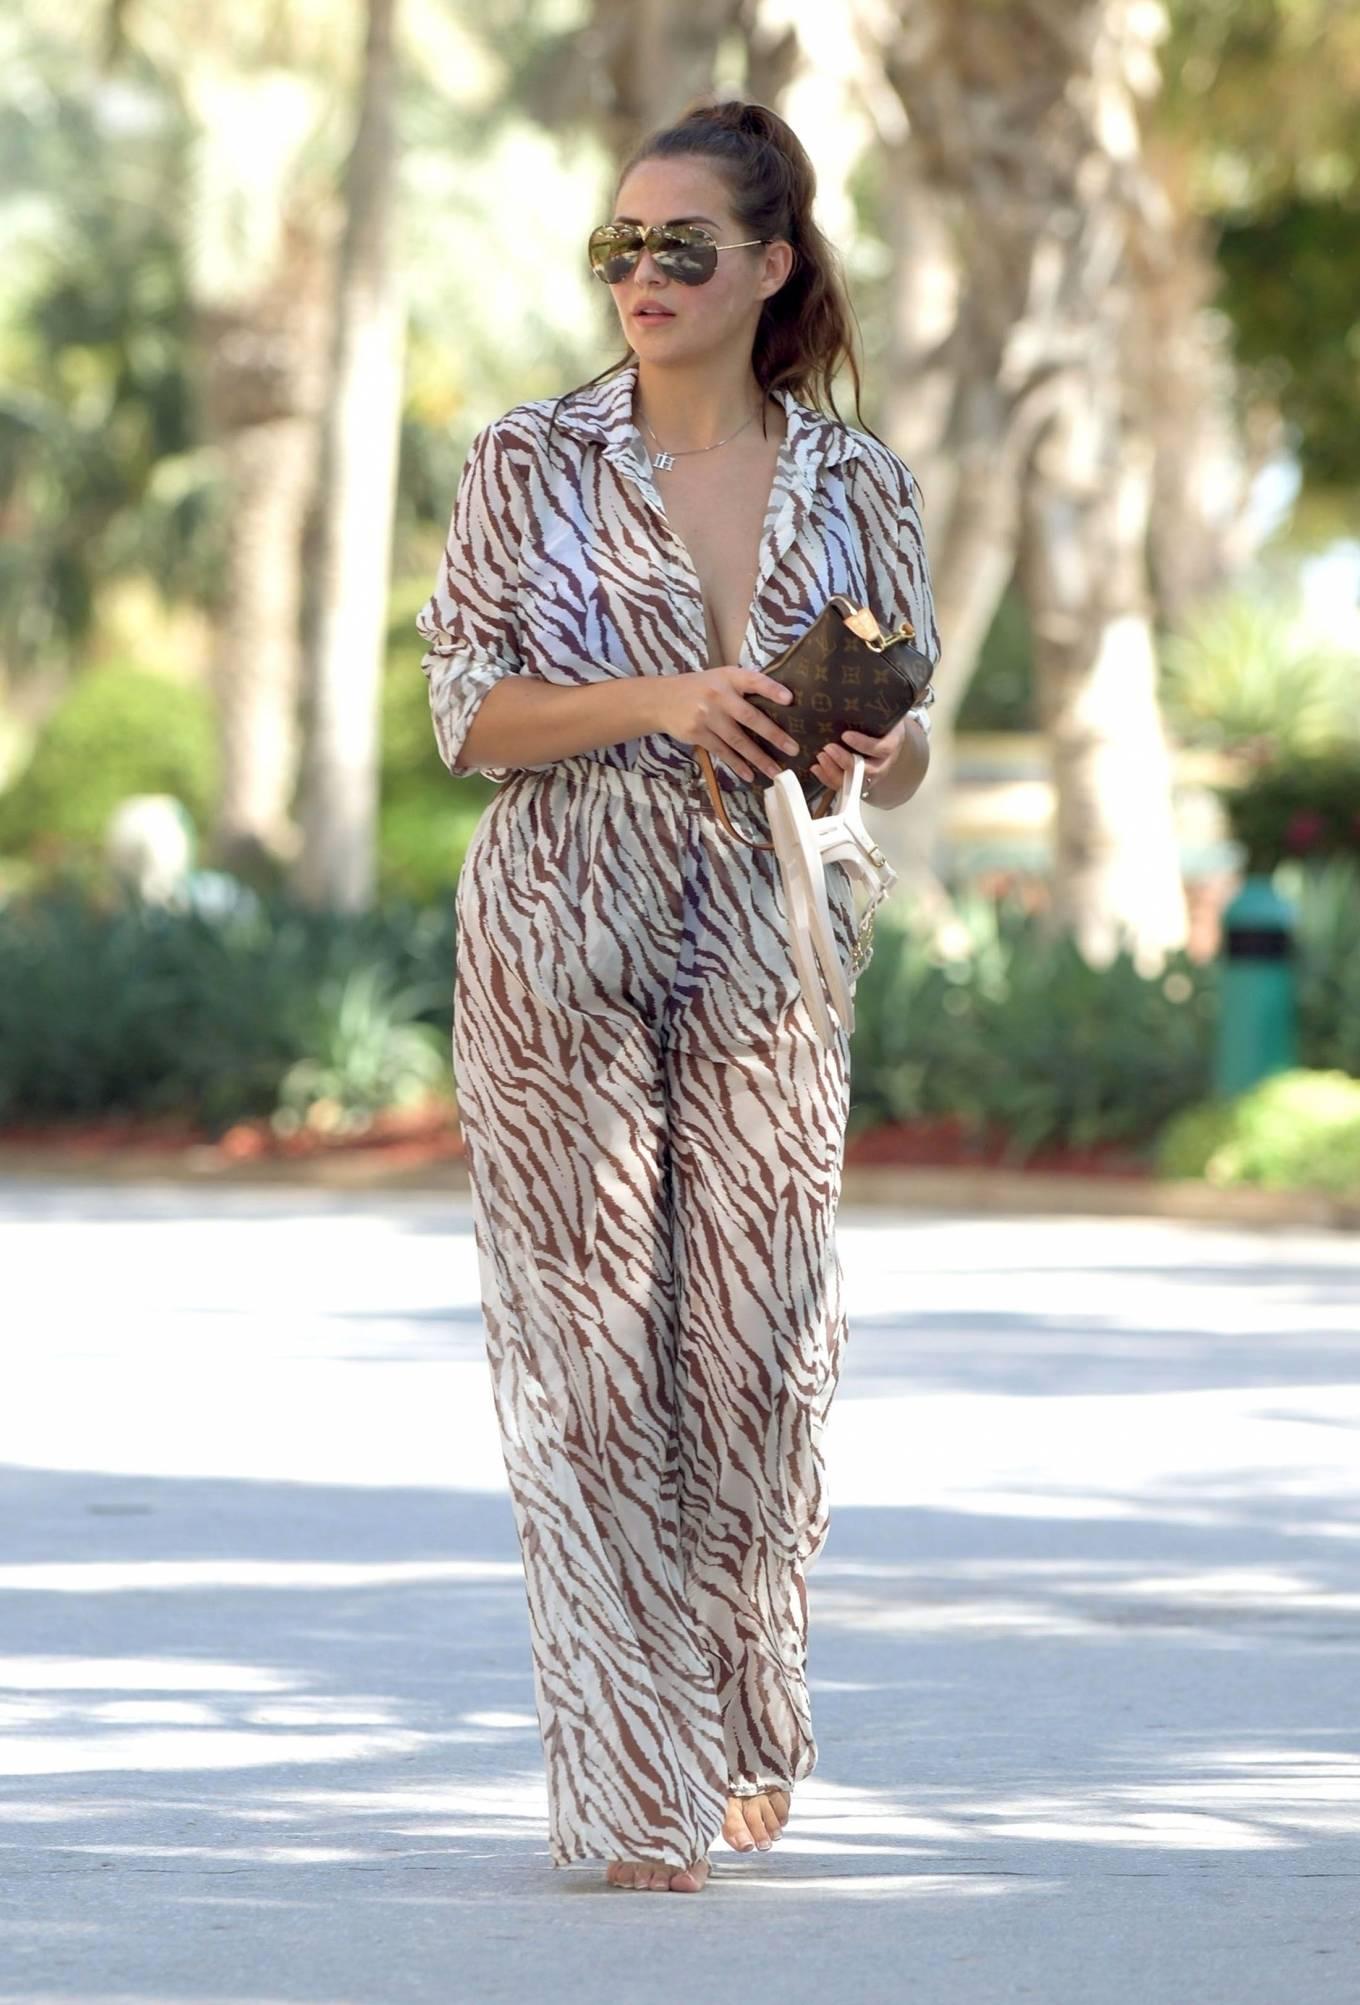 Chloe Goodman 2020 : Chloe Goodman – In a zebra print jumpsuit out on holiday in Dubai-12